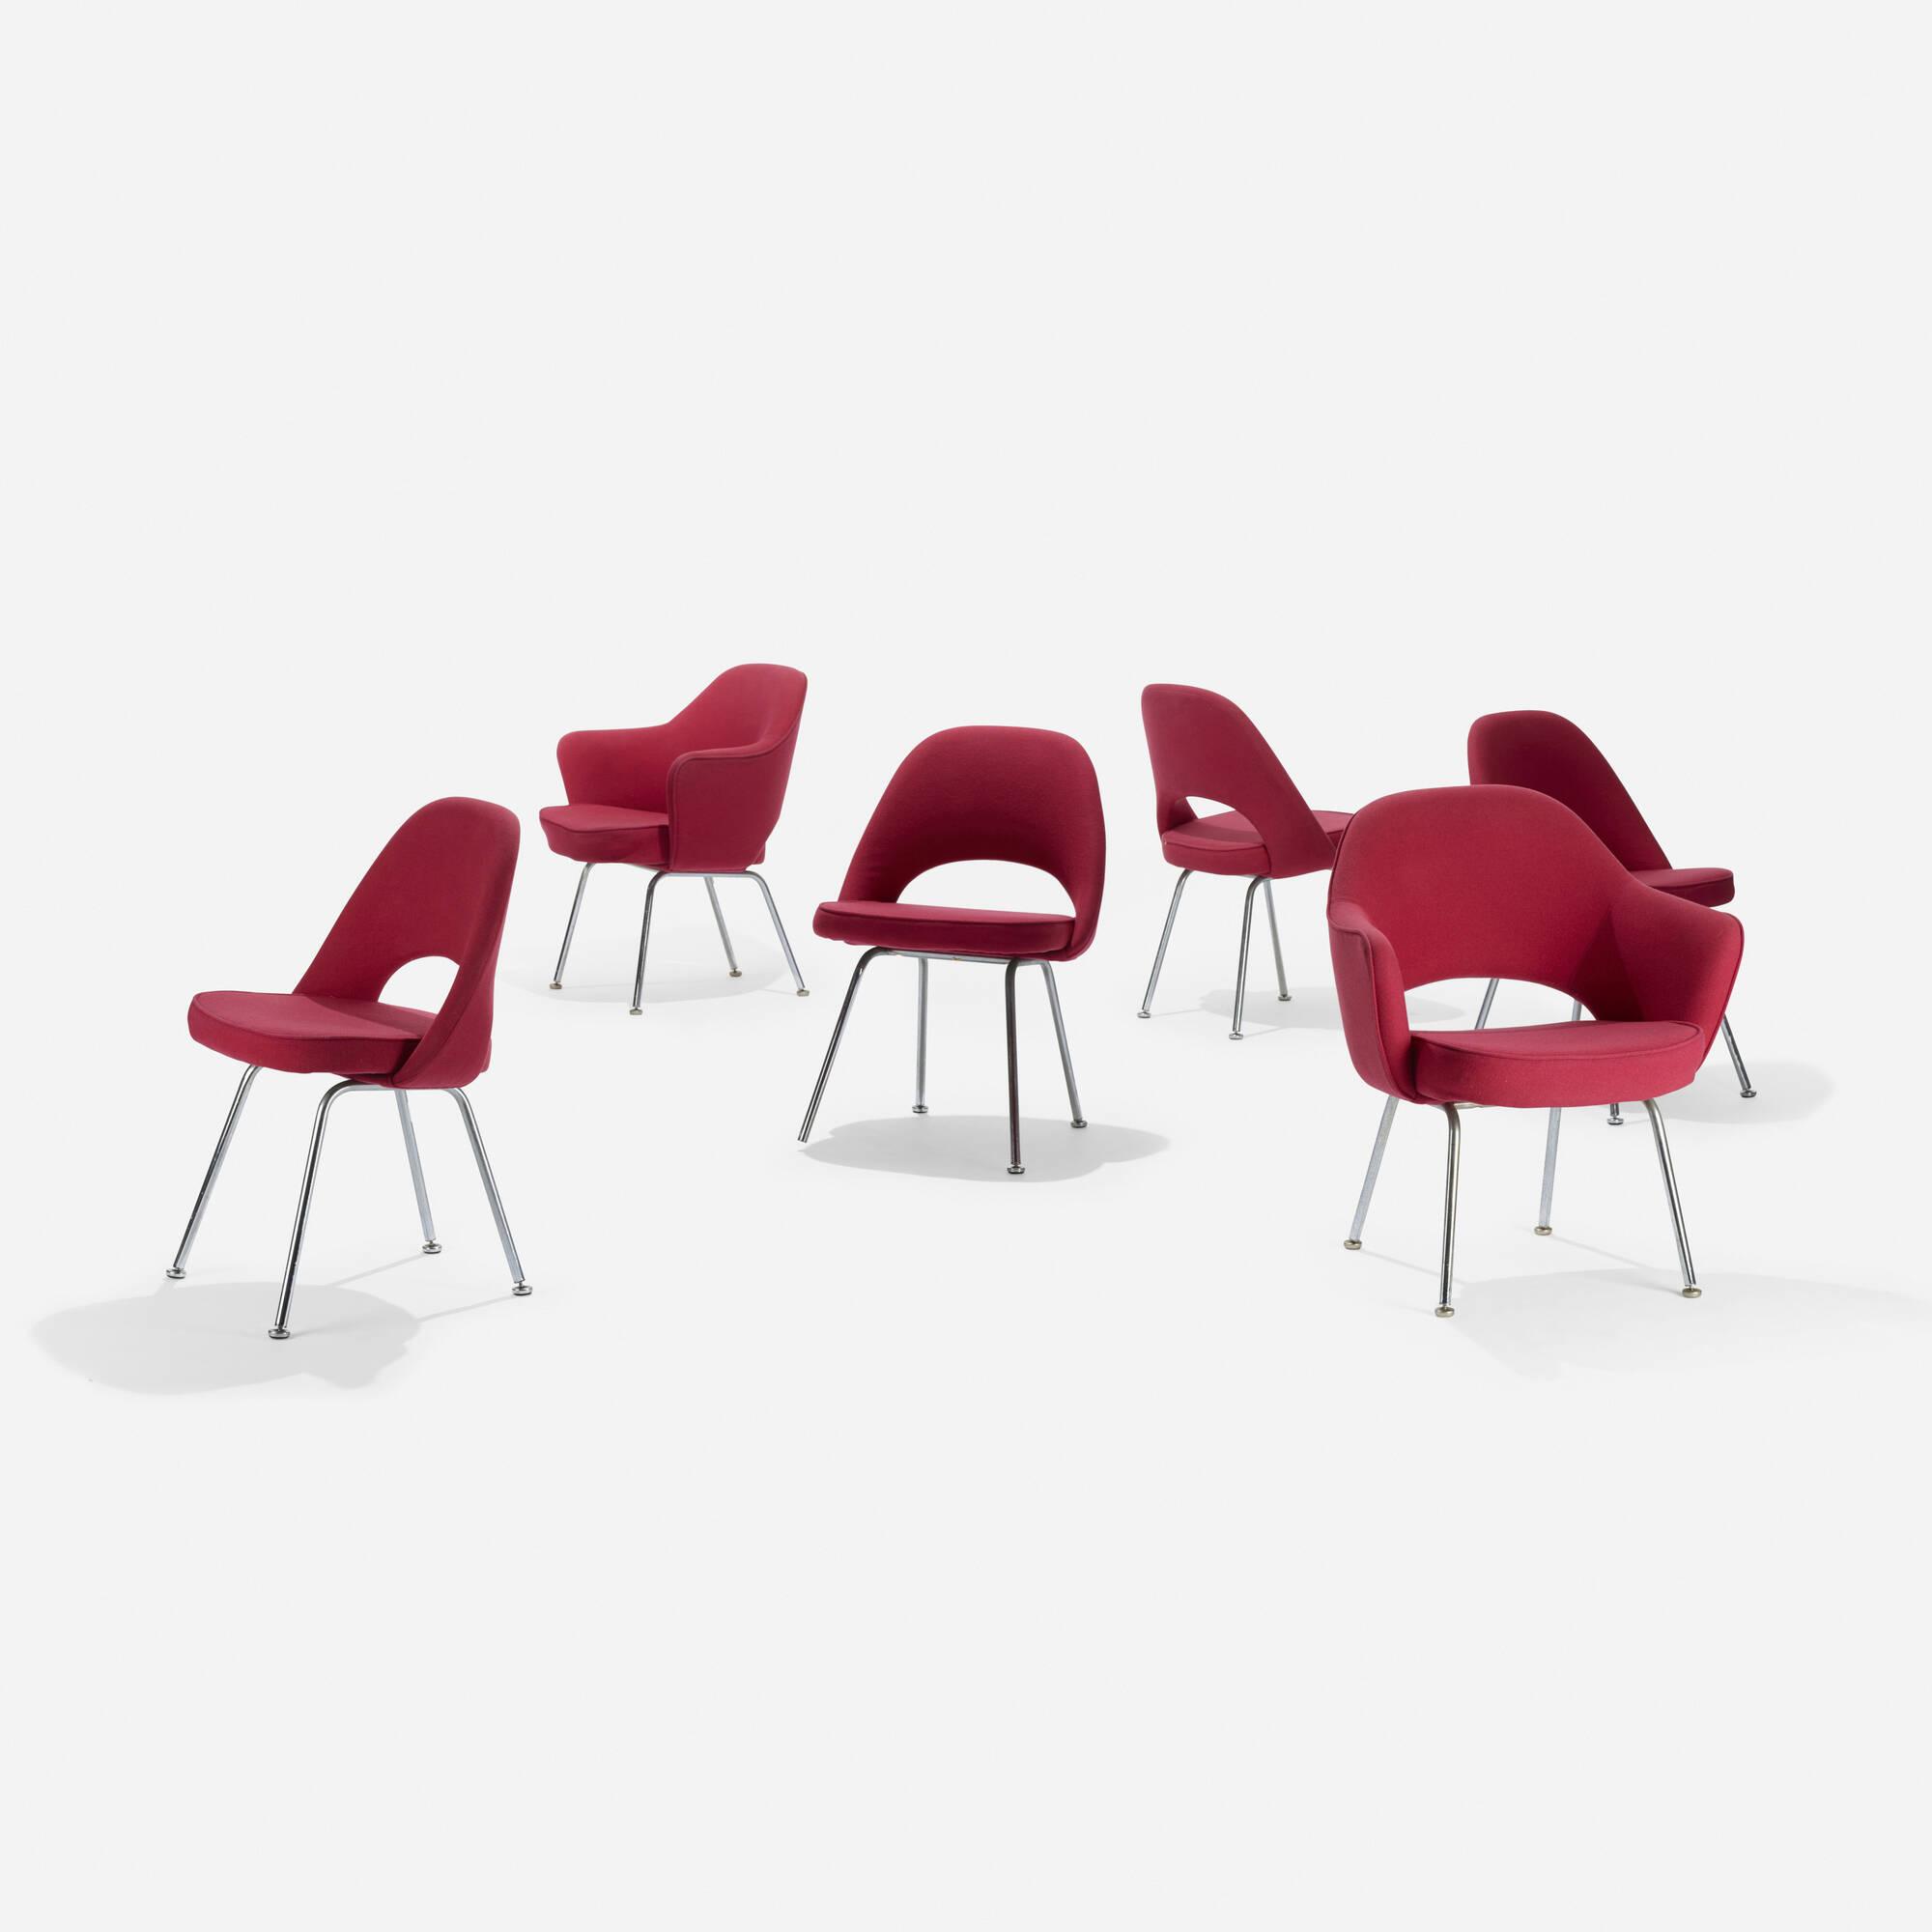 ... 219 Eero Saarinen / dining chairs set of six (2 of 3)  sc 1 st  Wright Auctions & 219: EERO SAARINEN dining chairs set of six u003c American Design 15 ...